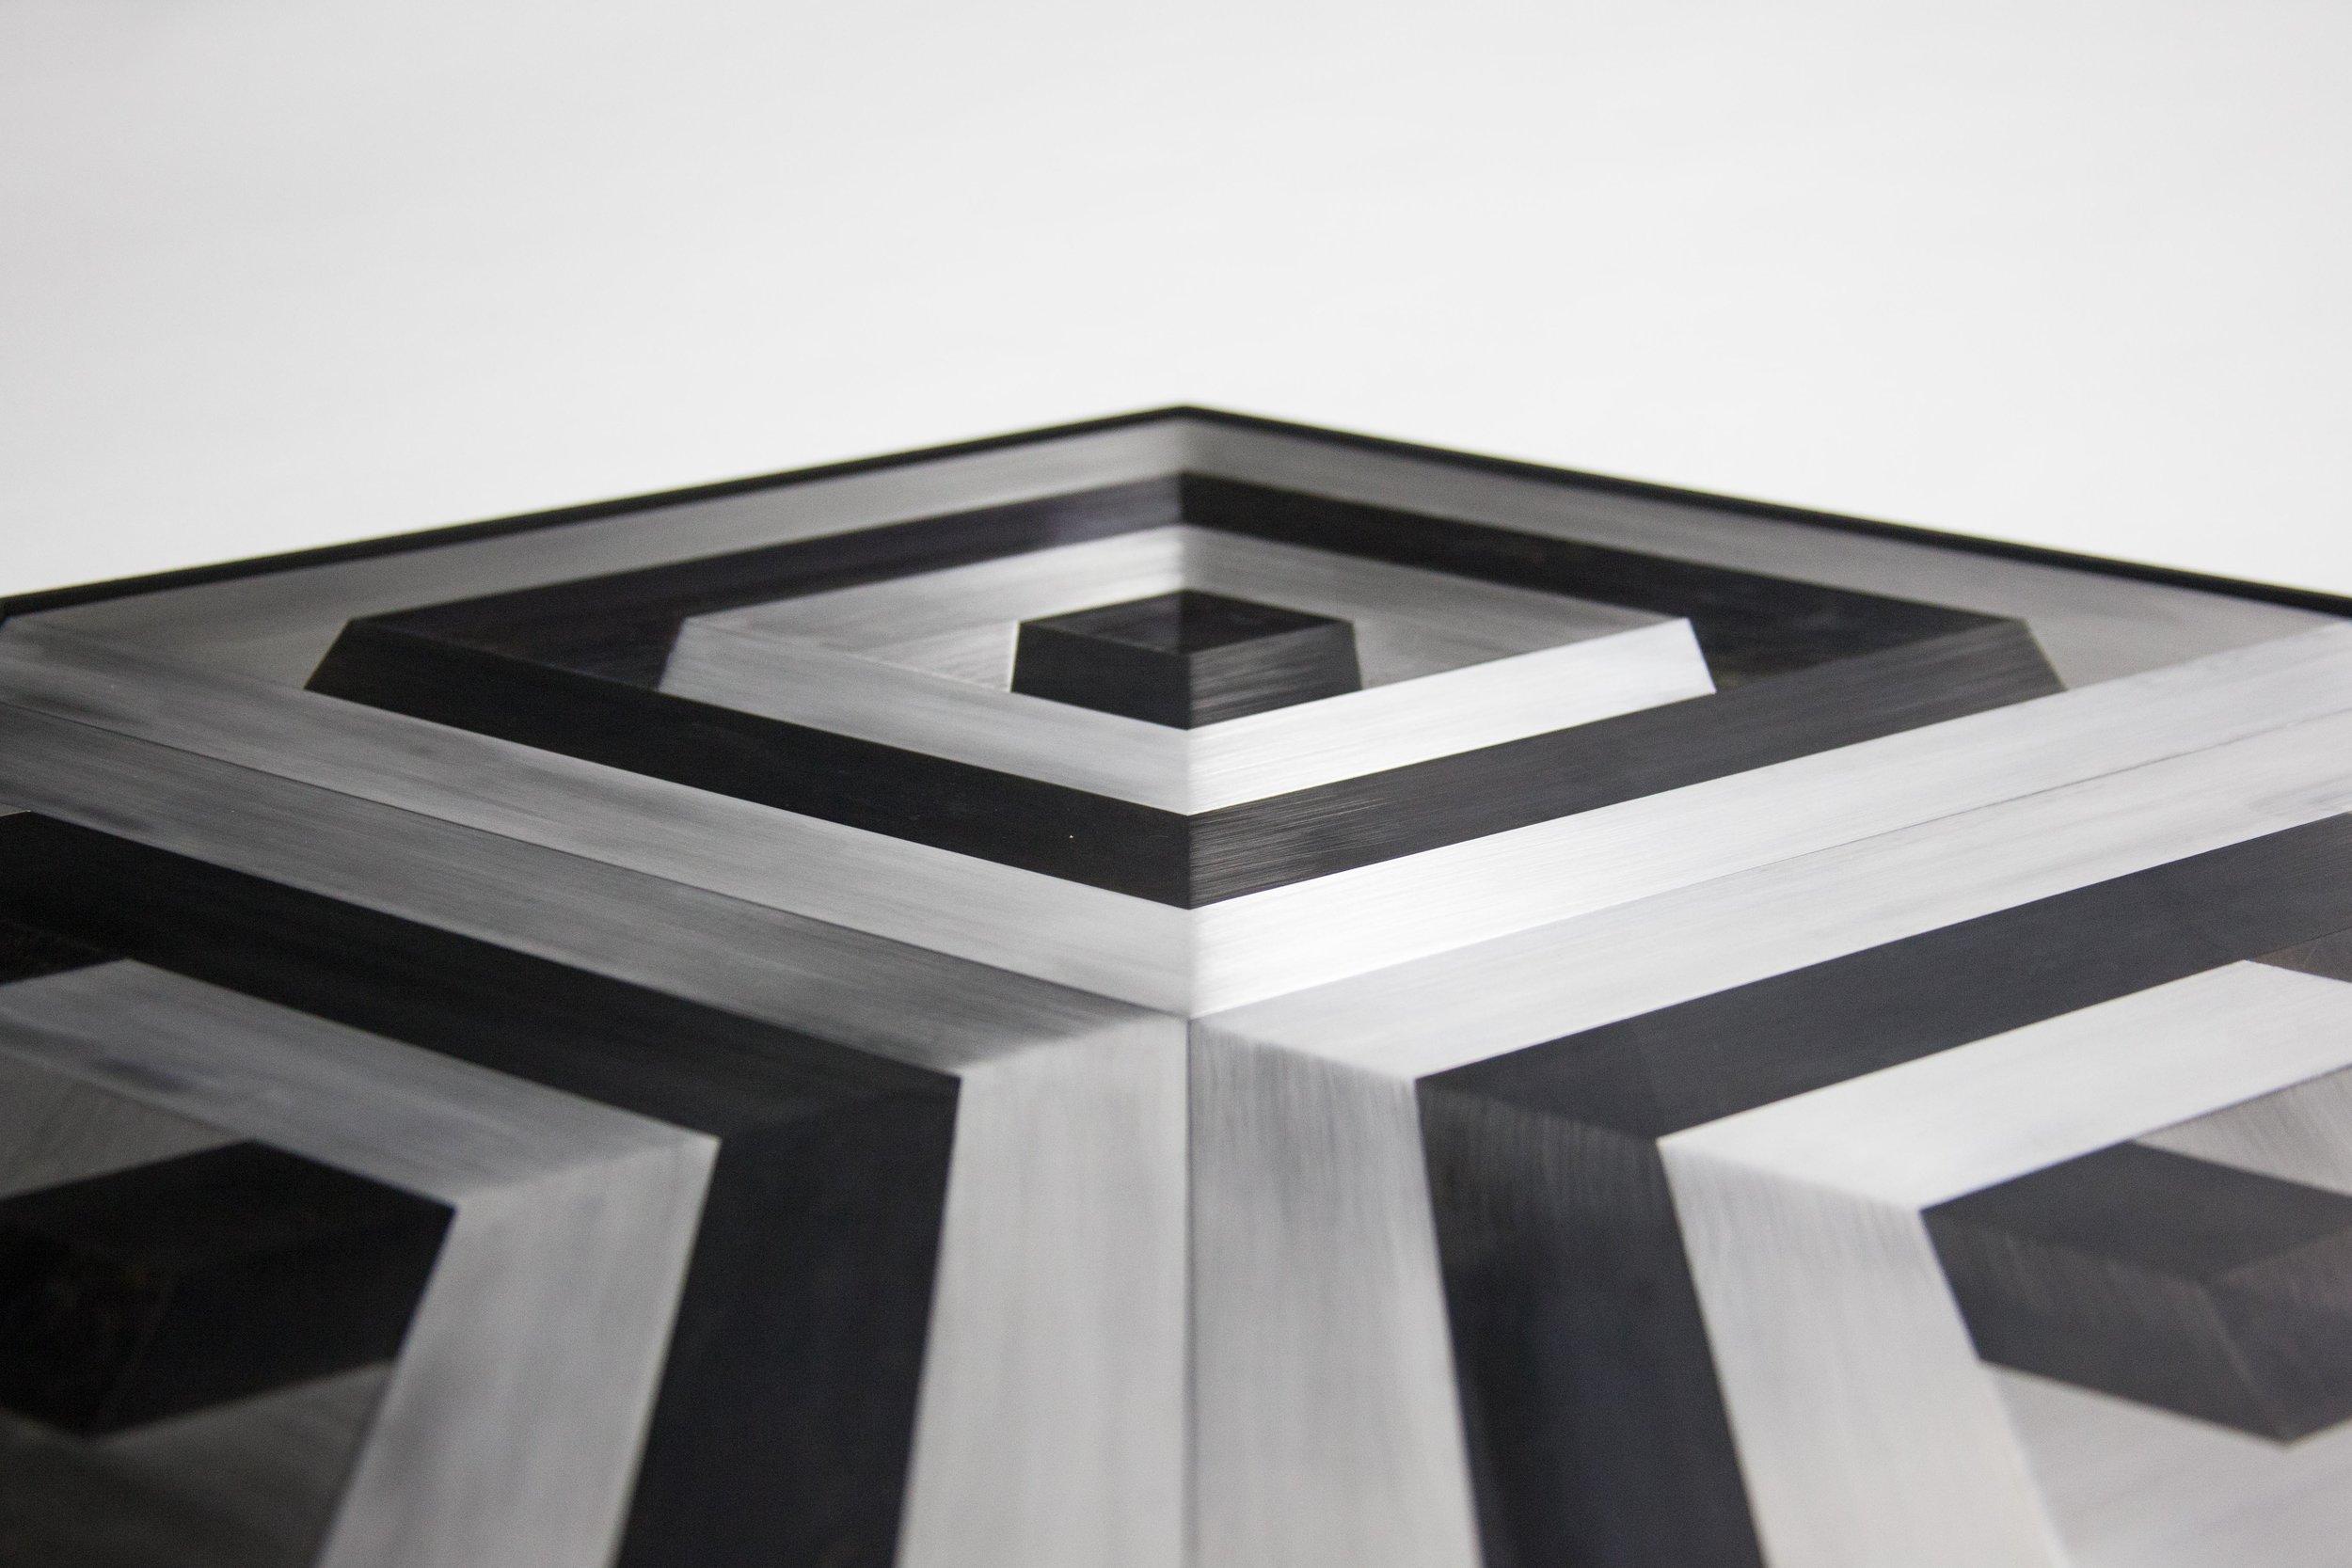 2017-02 Cube Rose No. 4 -5.jpg